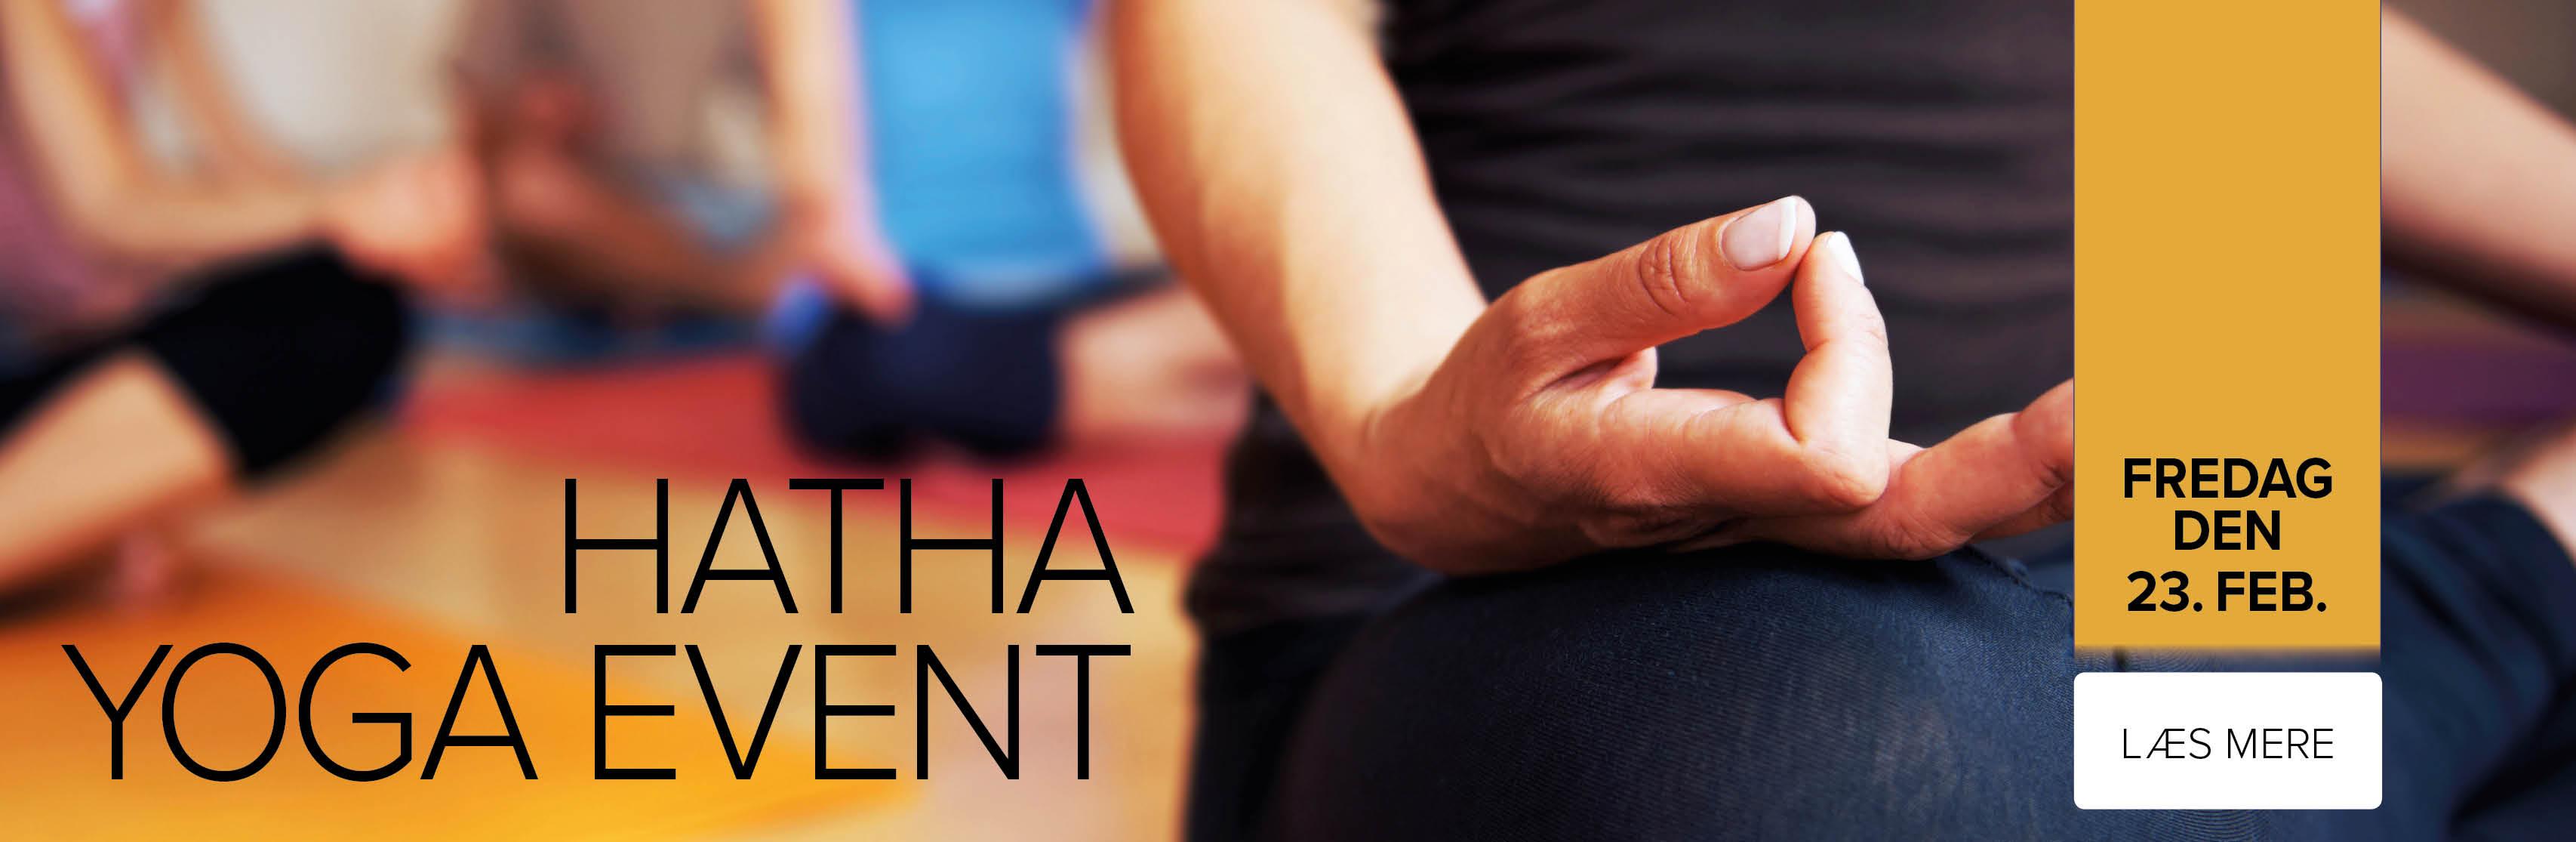 HATHA YOGA EVENT